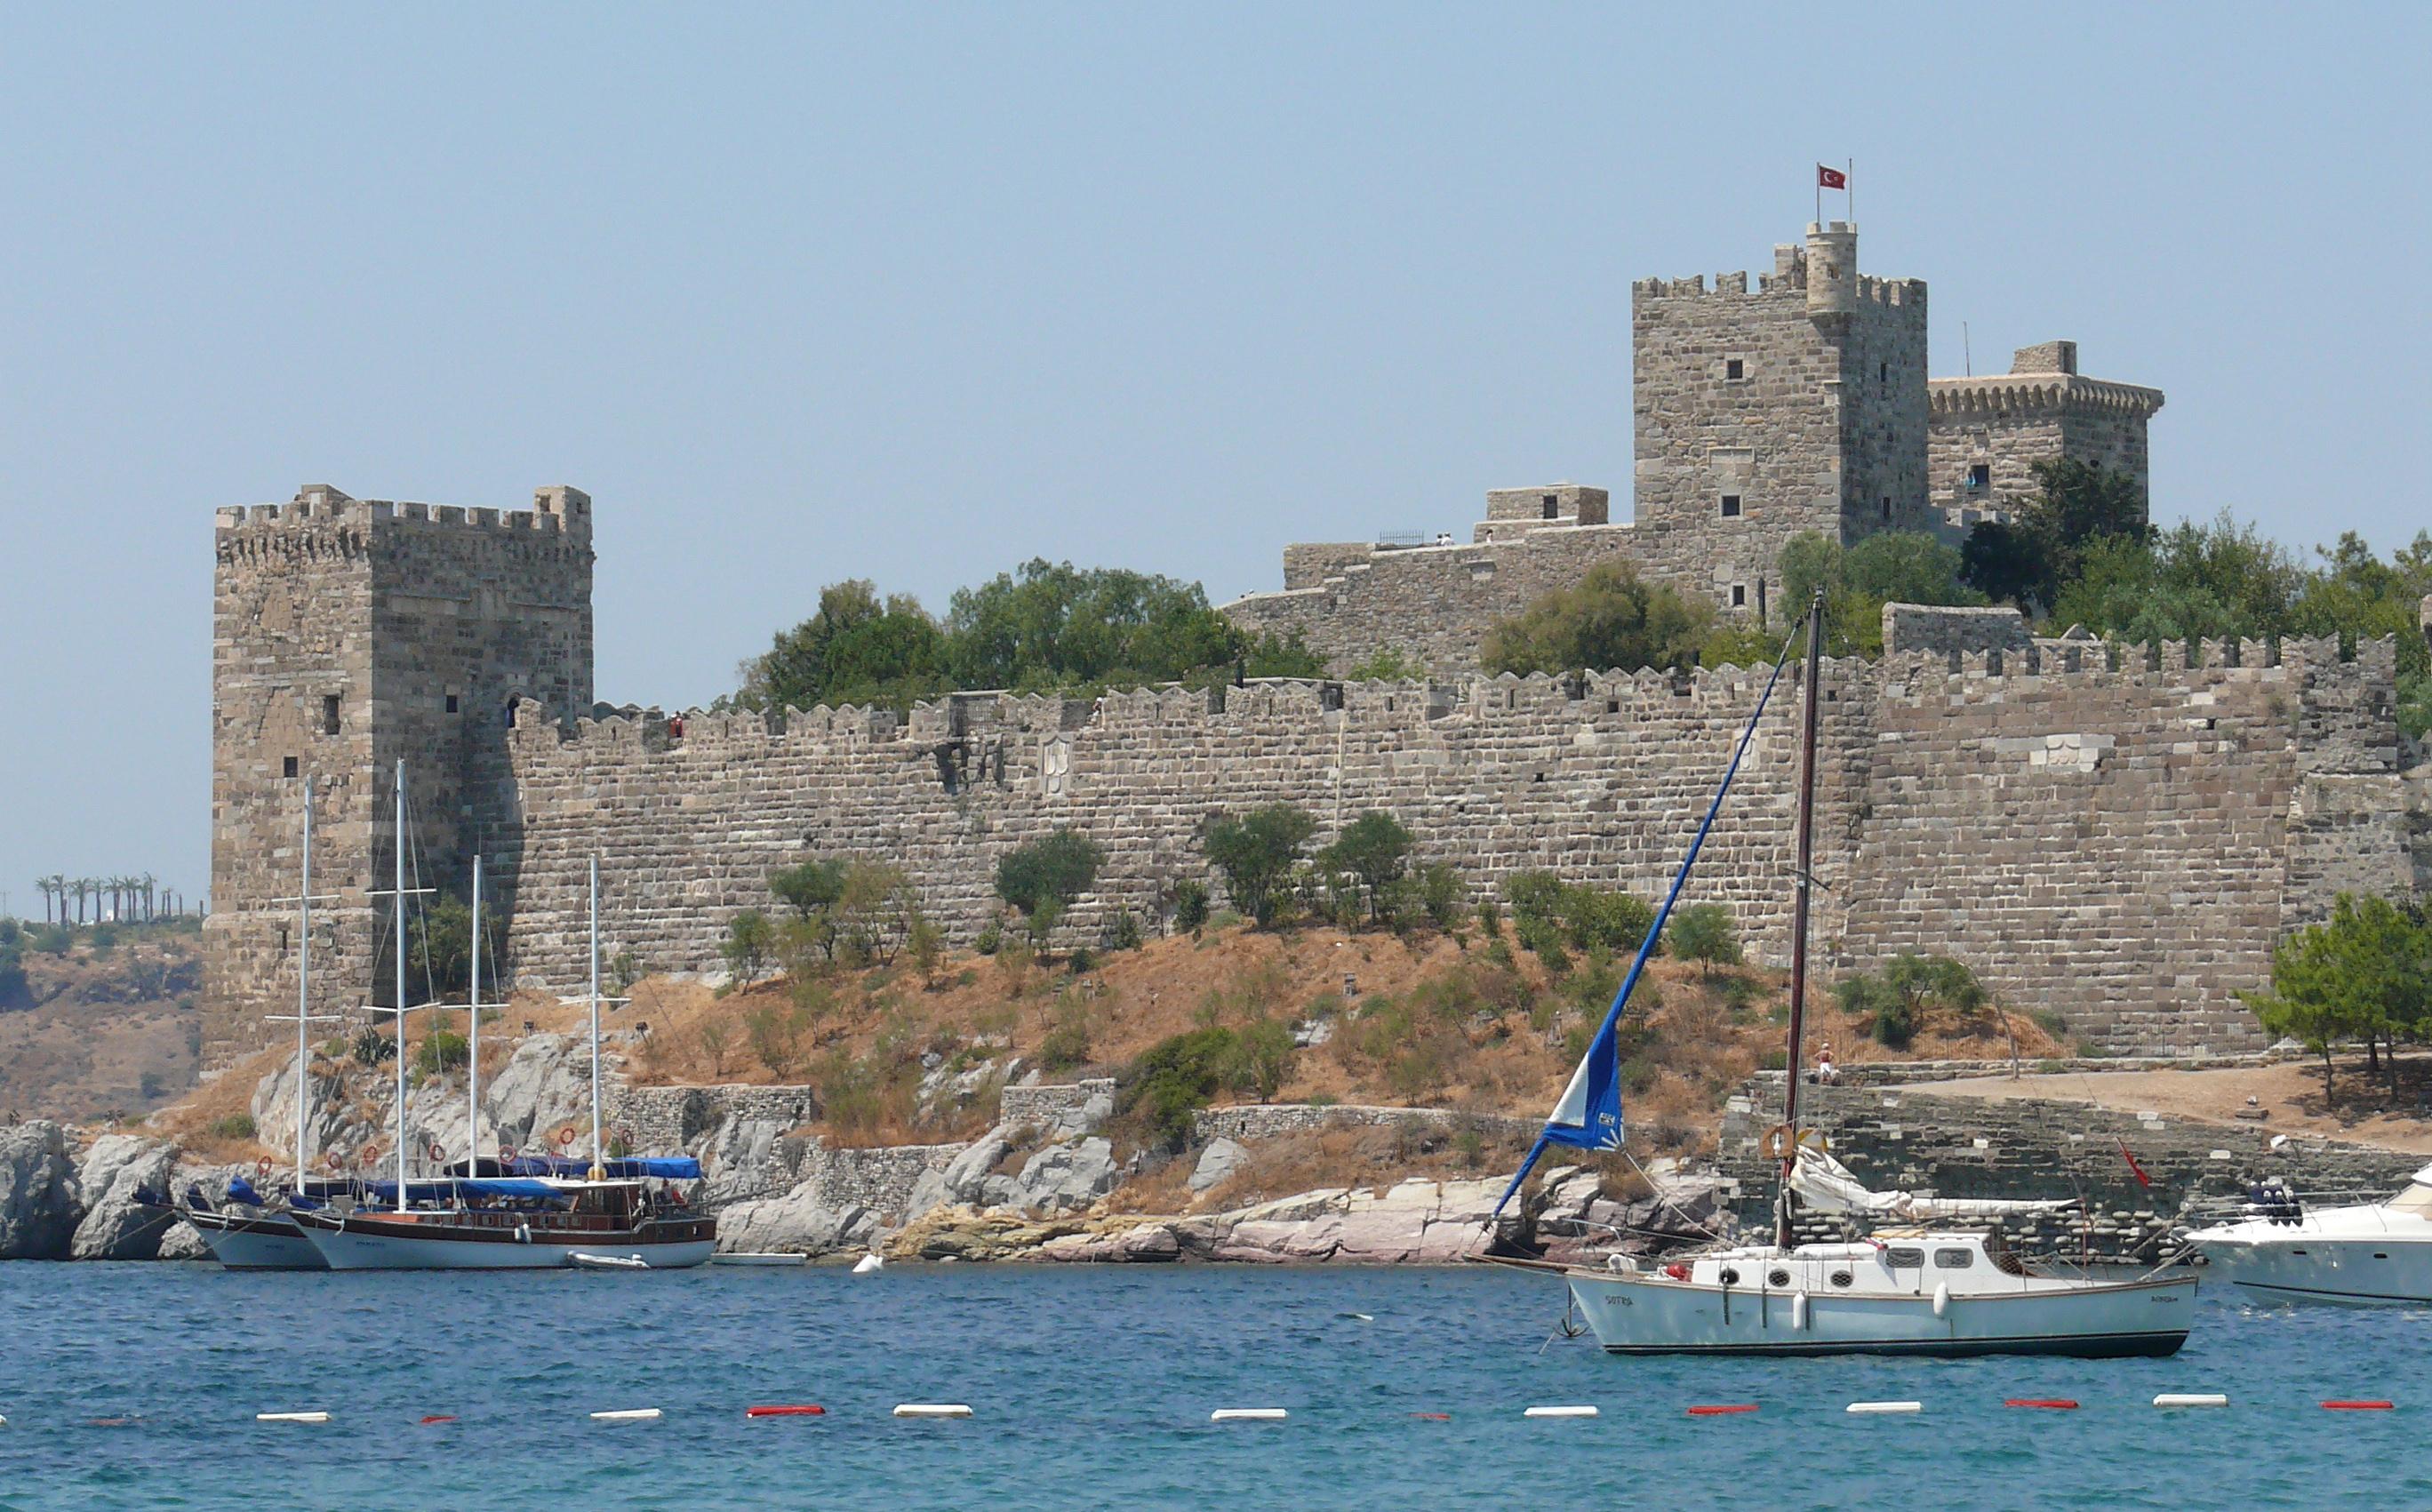 Castle of St. Peter